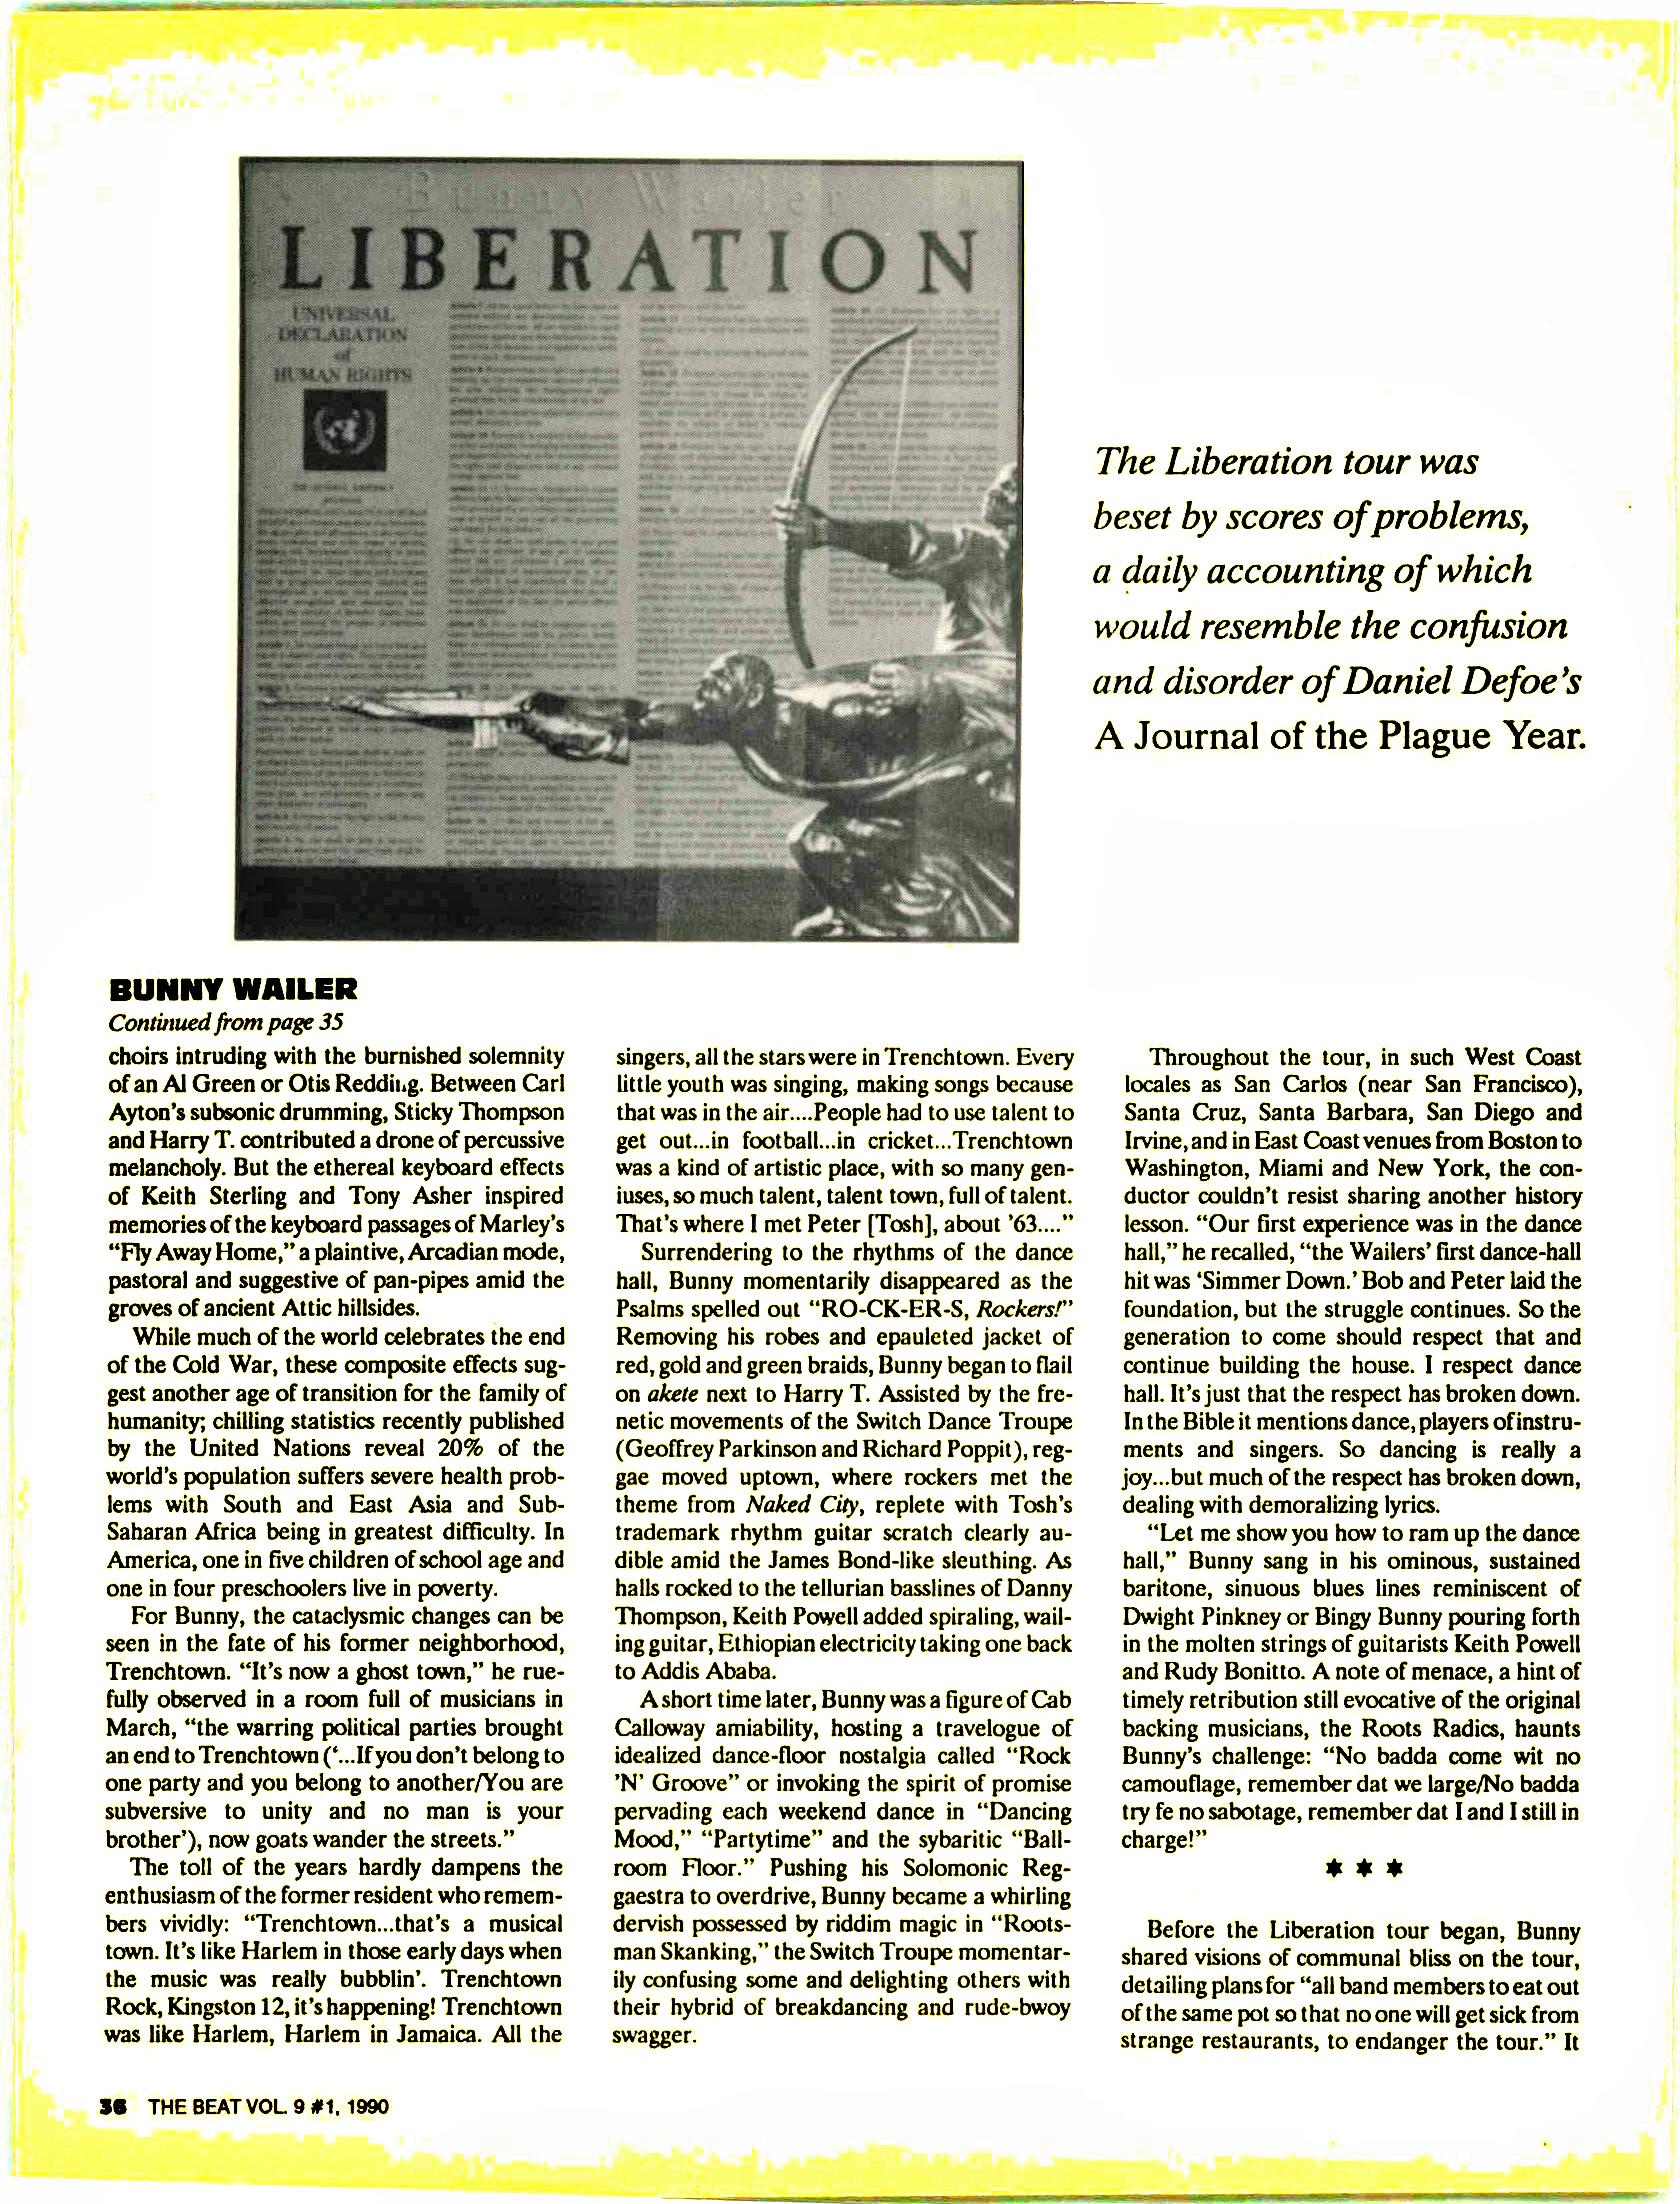 Bunny Wailer Black Vinyl 97